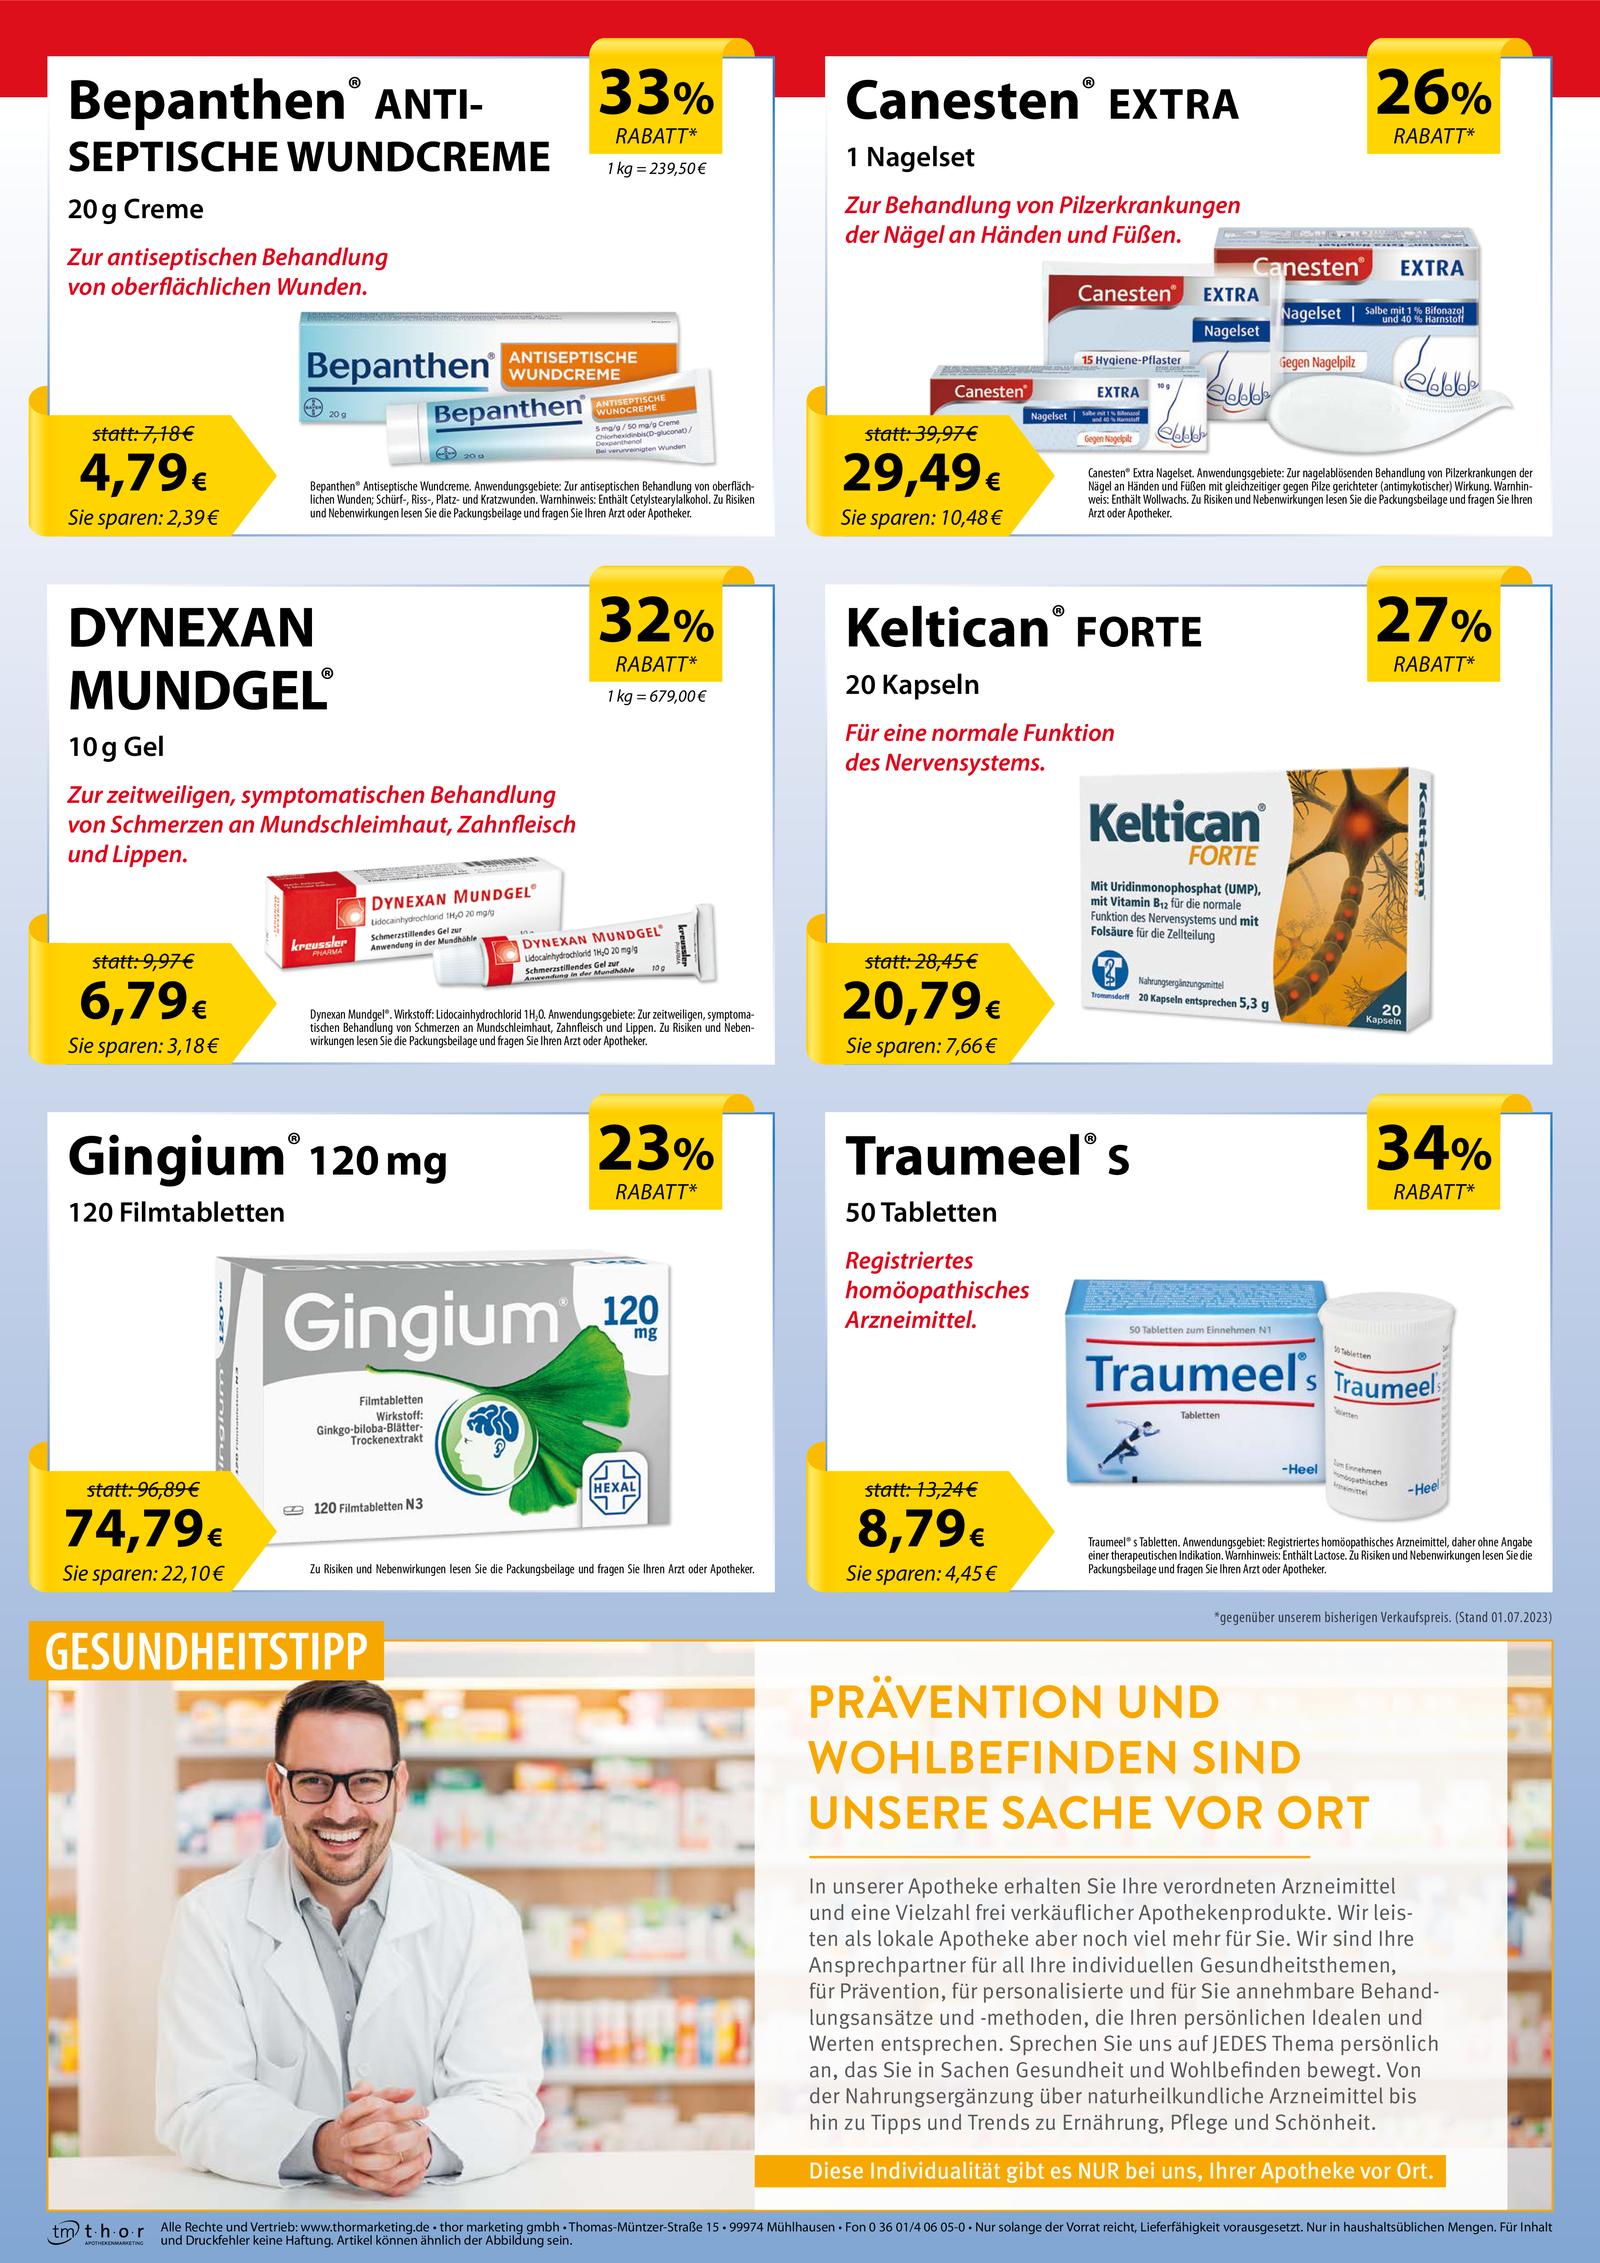 https://mein-uploads.apocdn.net/1028/leaflets/1028_flyer-Seite4.png